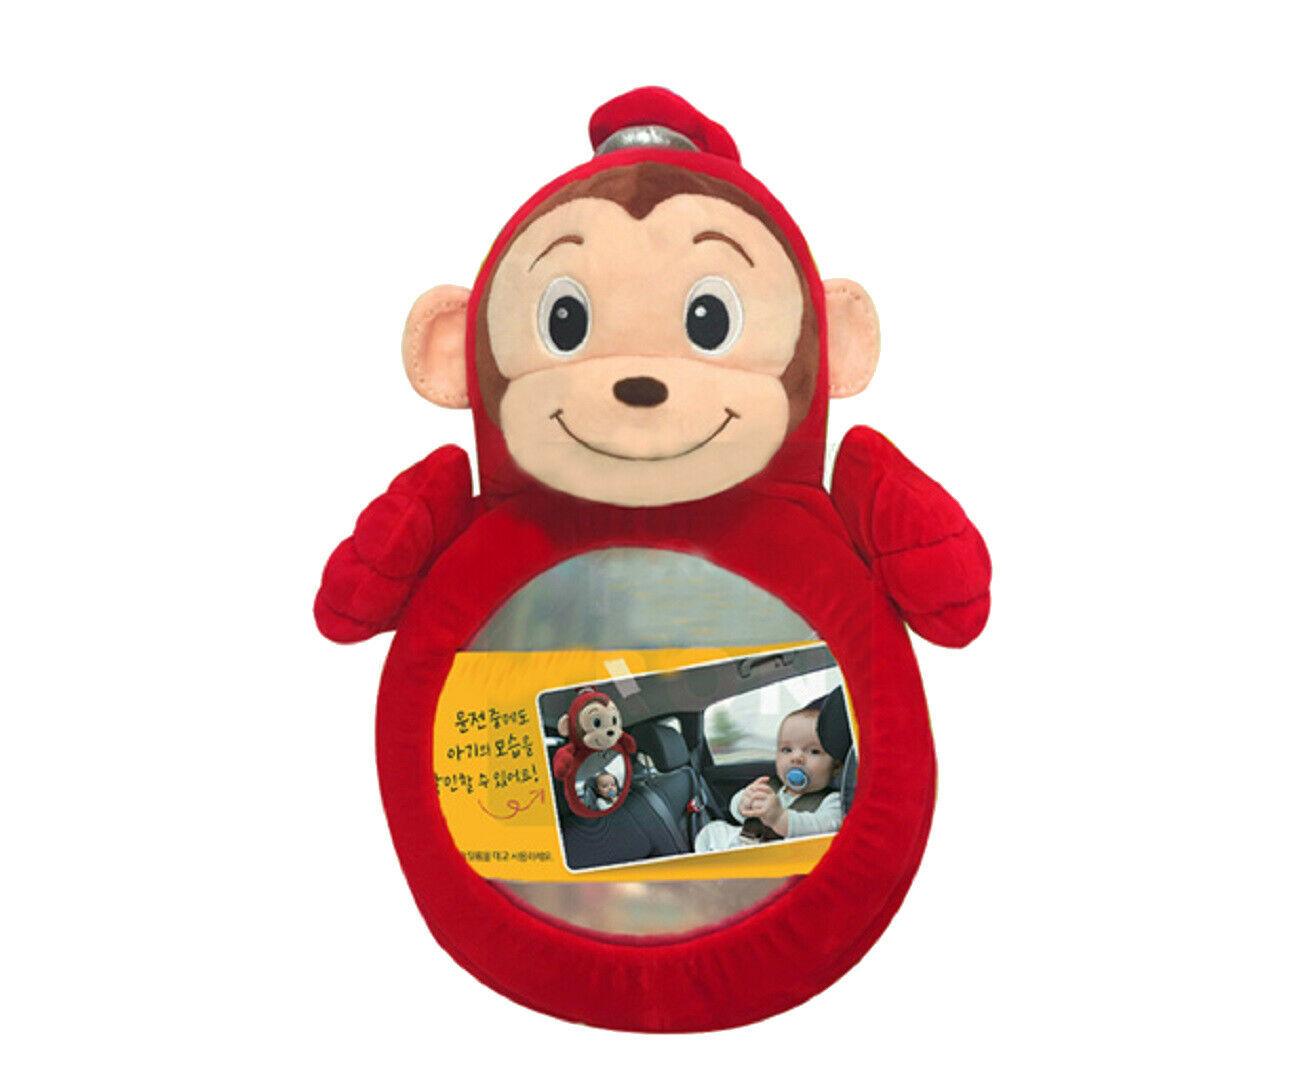 "Toy Trons Coco Mong Mirror Stuffed Animal Monkey Plush Toy 13.7"" 35cm"